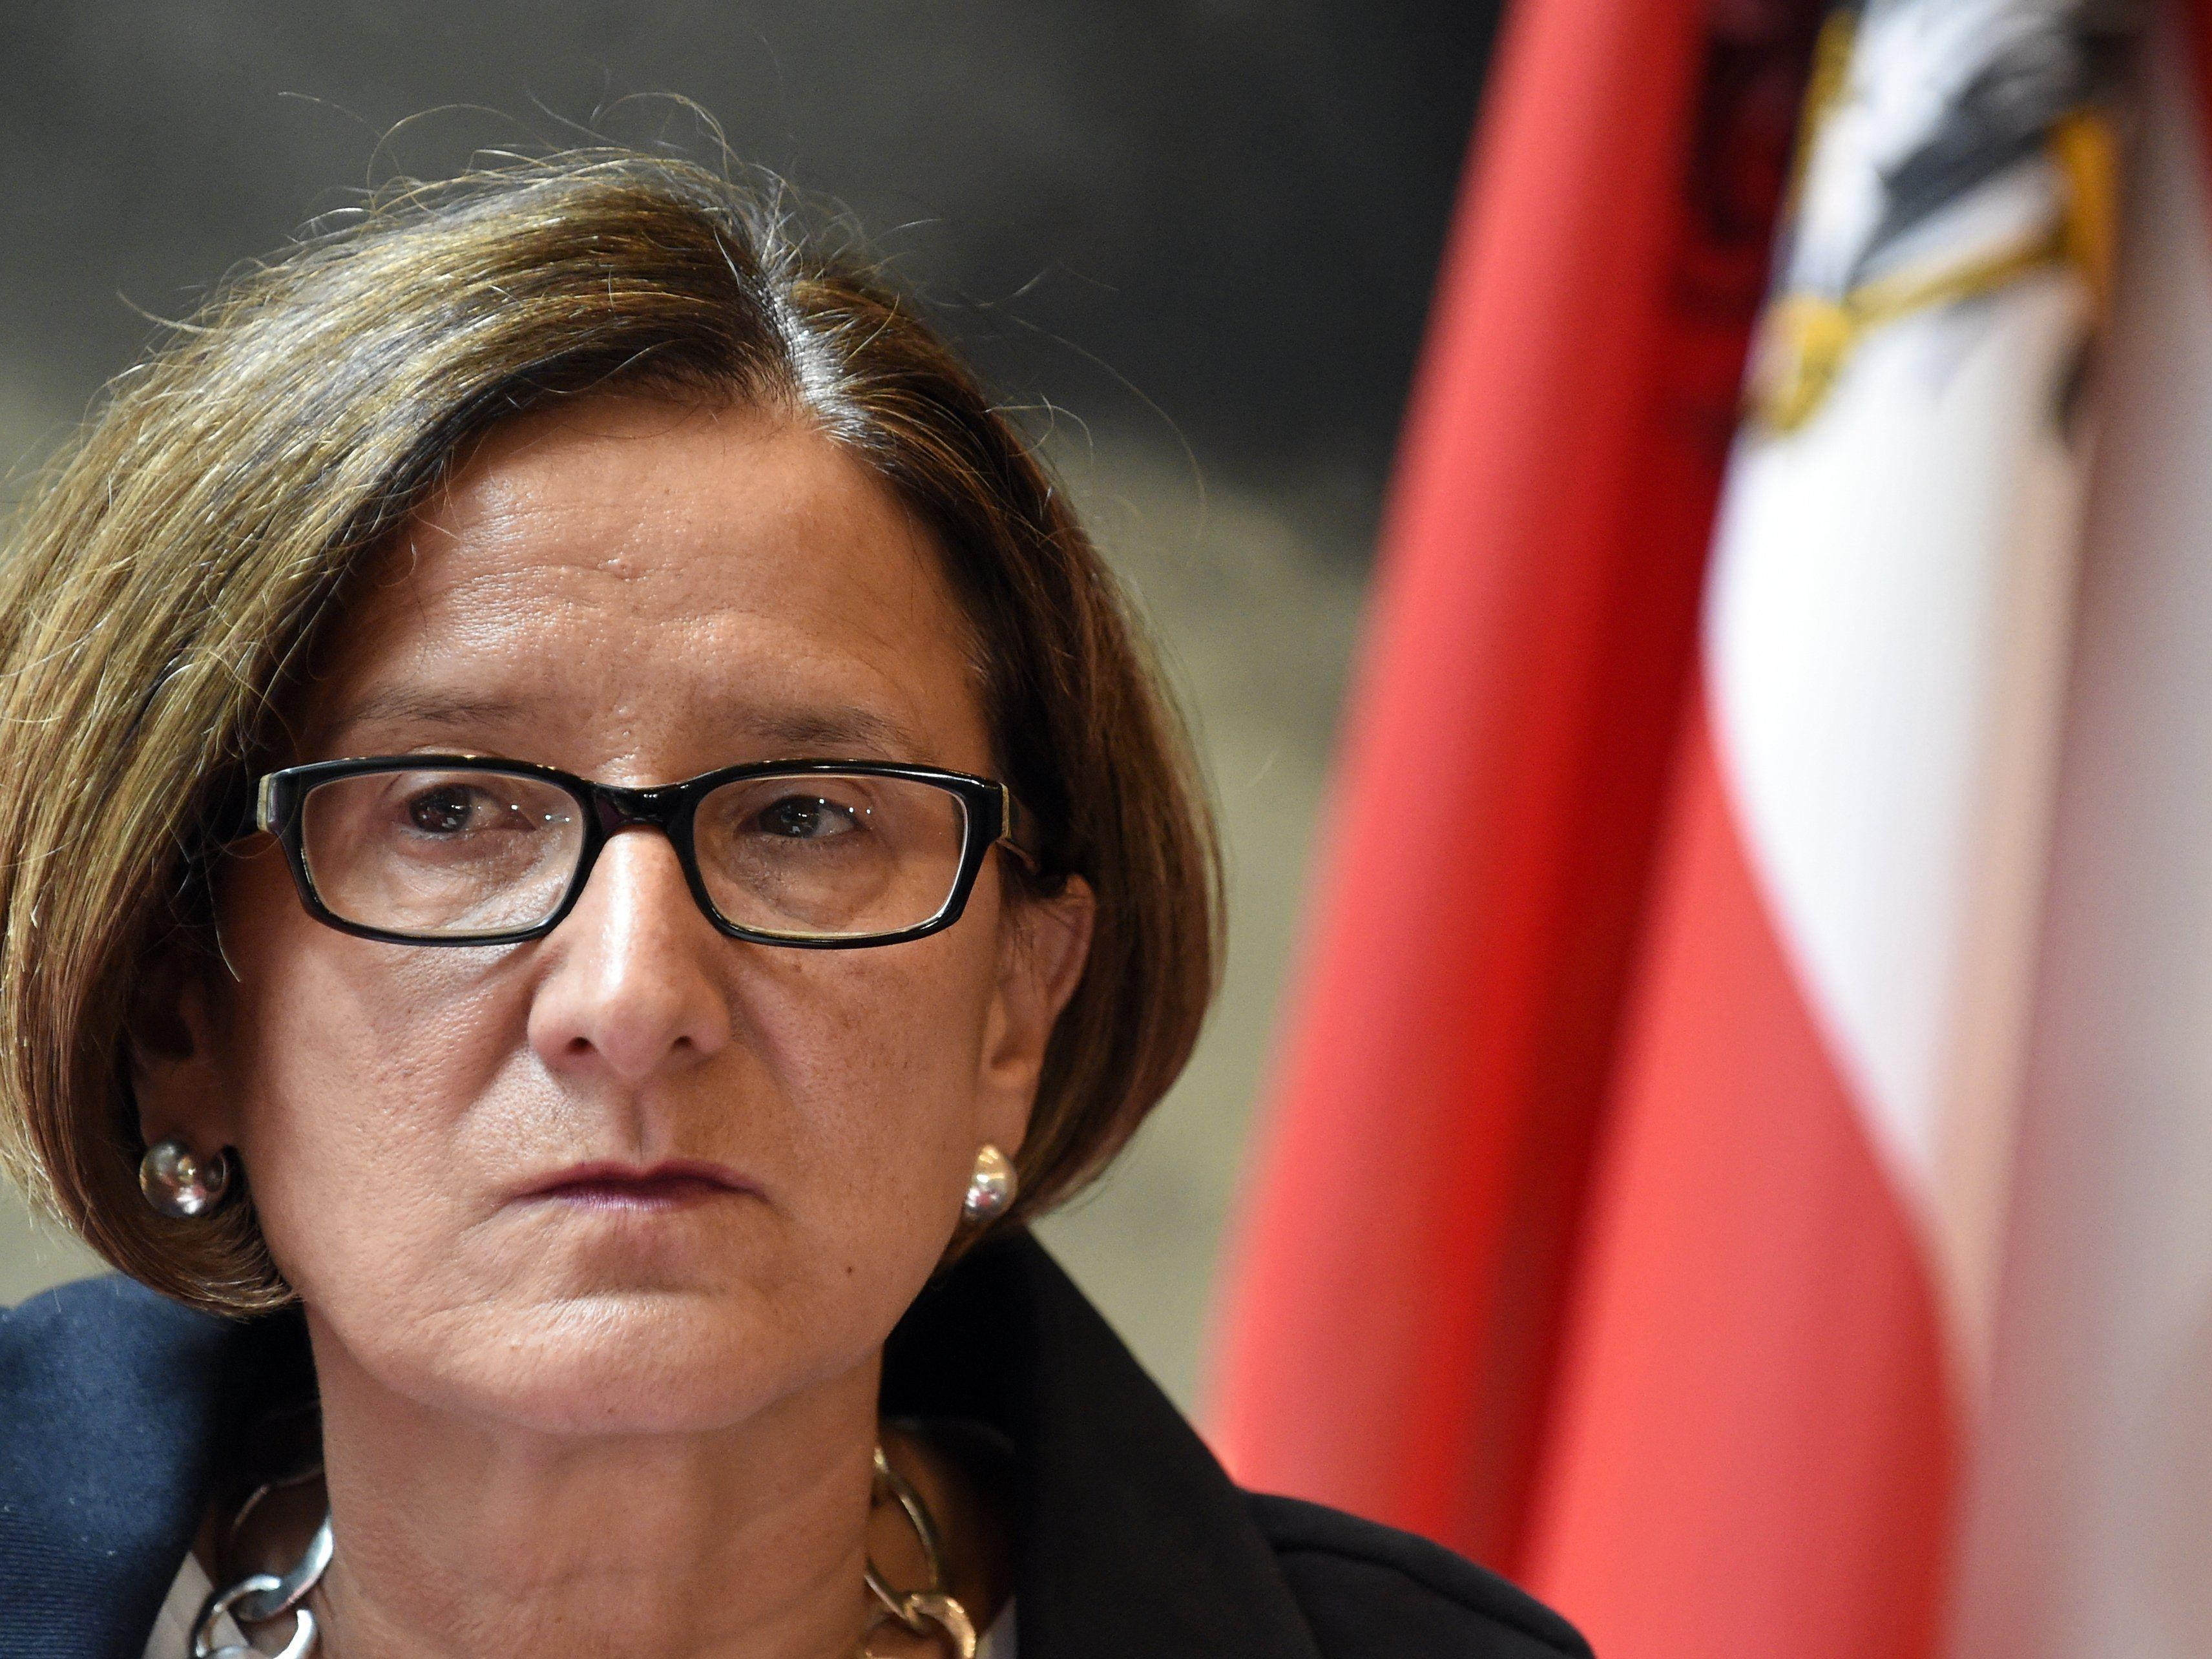 nenministerin Johanna Mikl-Leitner wird in Sachen Asyl heftig kritisiert